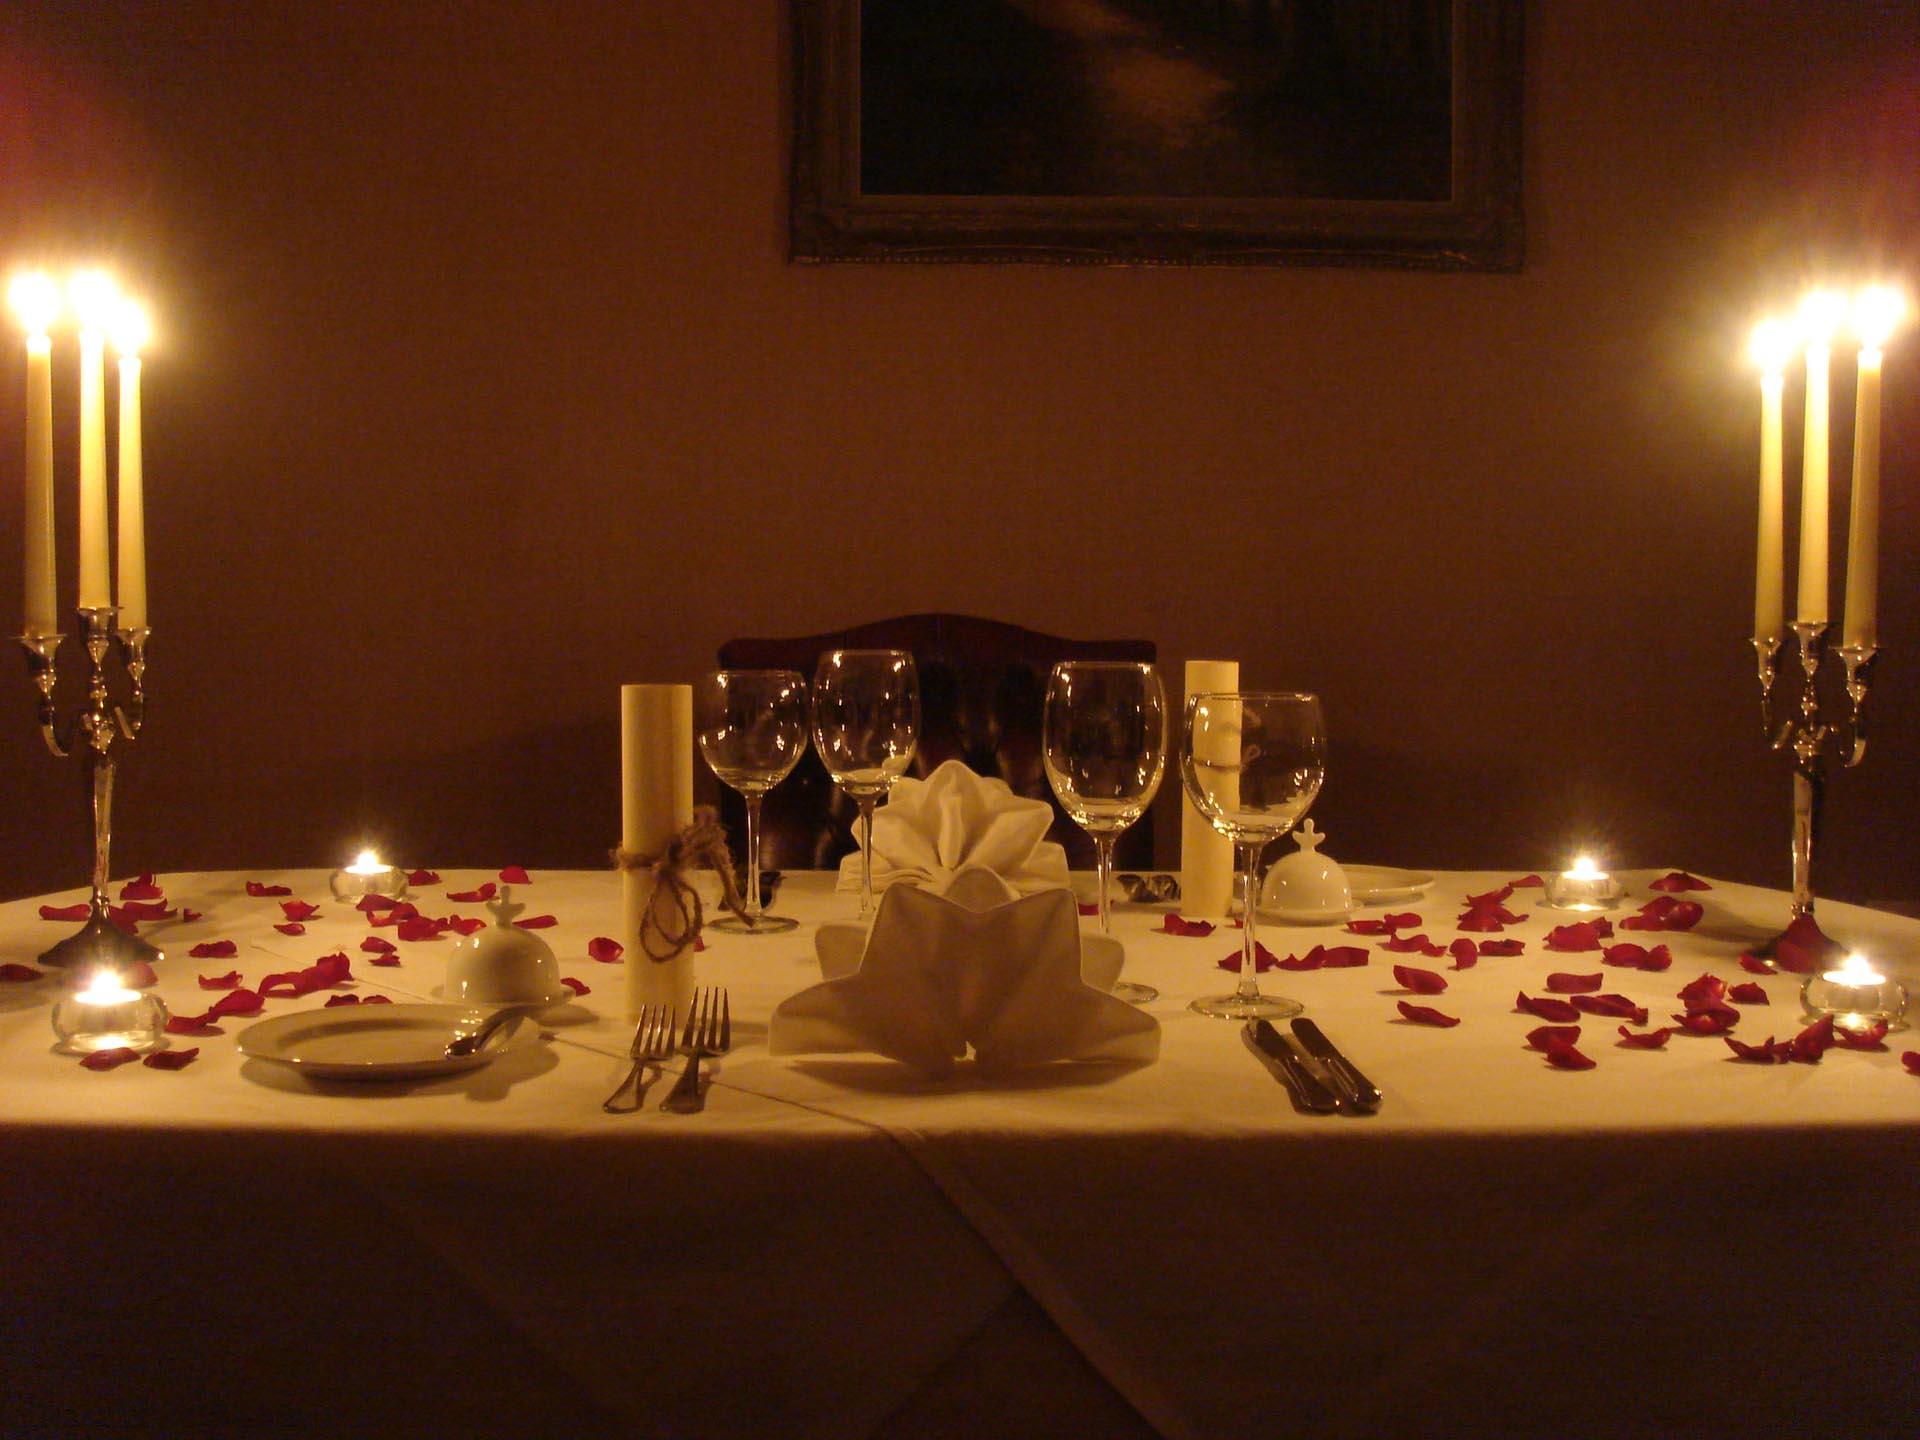 Candle light dinner - بهترین ایدهها برای هدیه روز تولد همسرتان